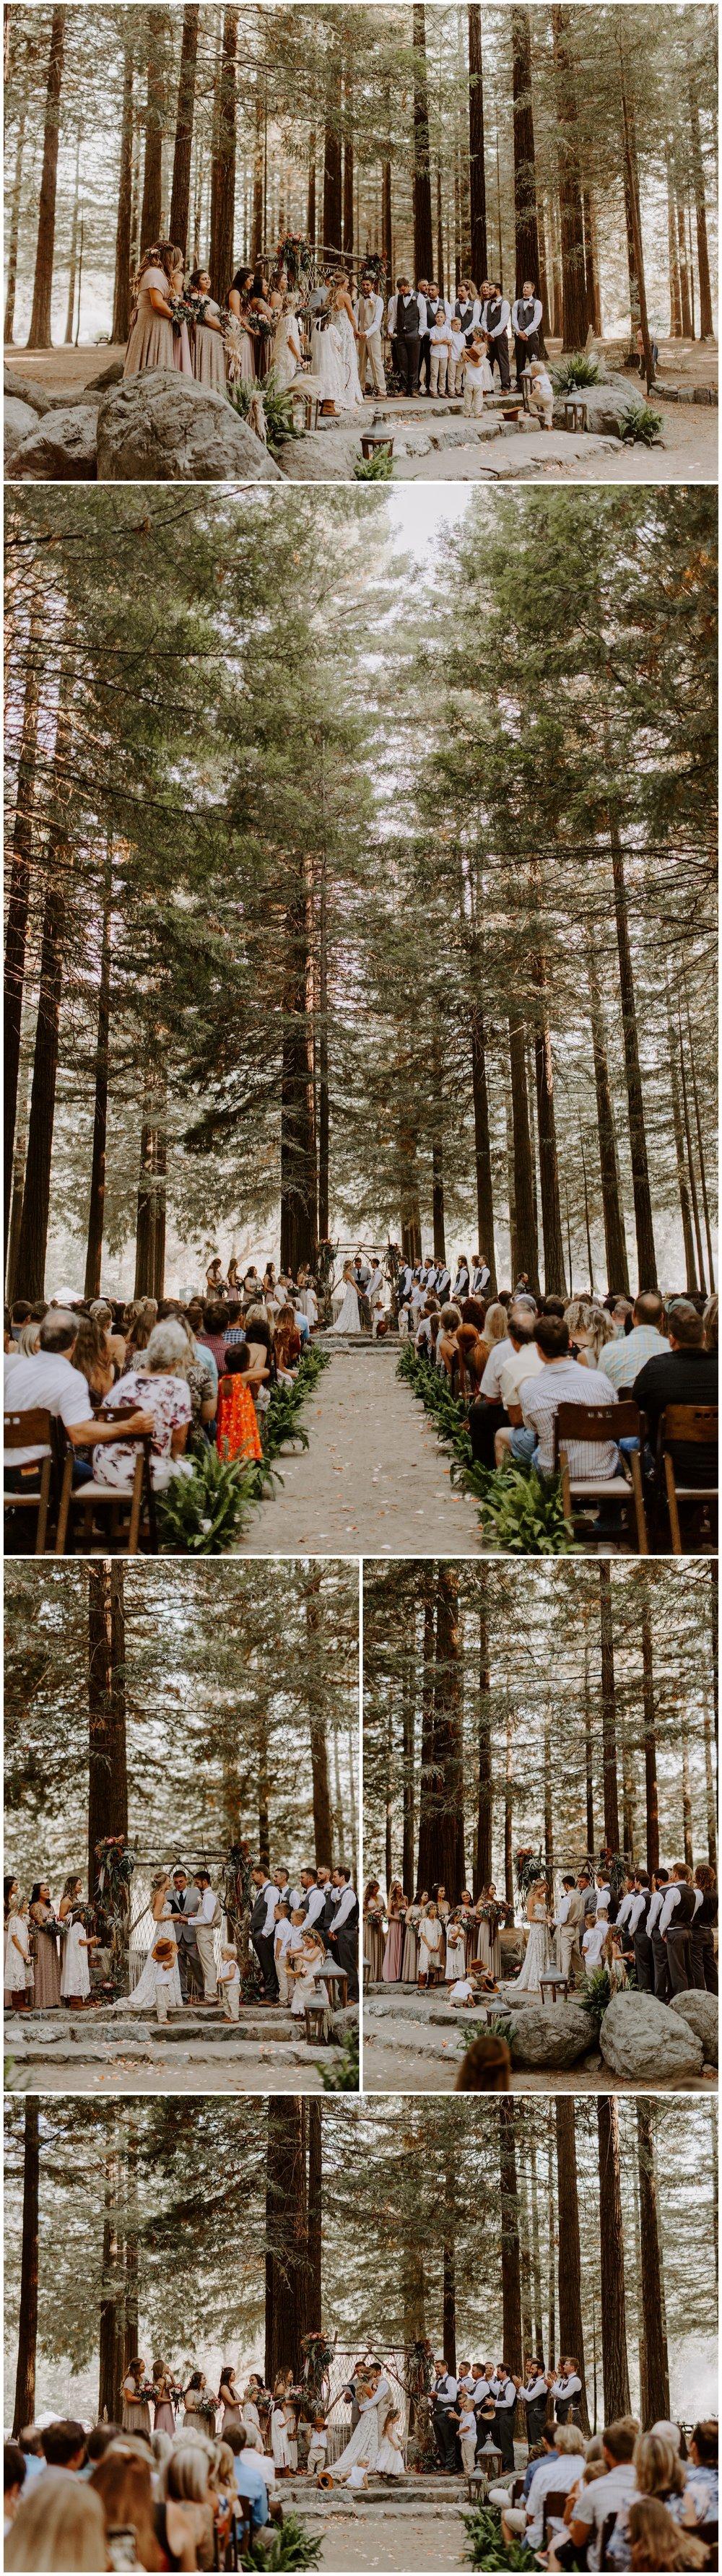 Redwood Festival Wedding Humbolt California - Jessica Heron Images_0037.jpg